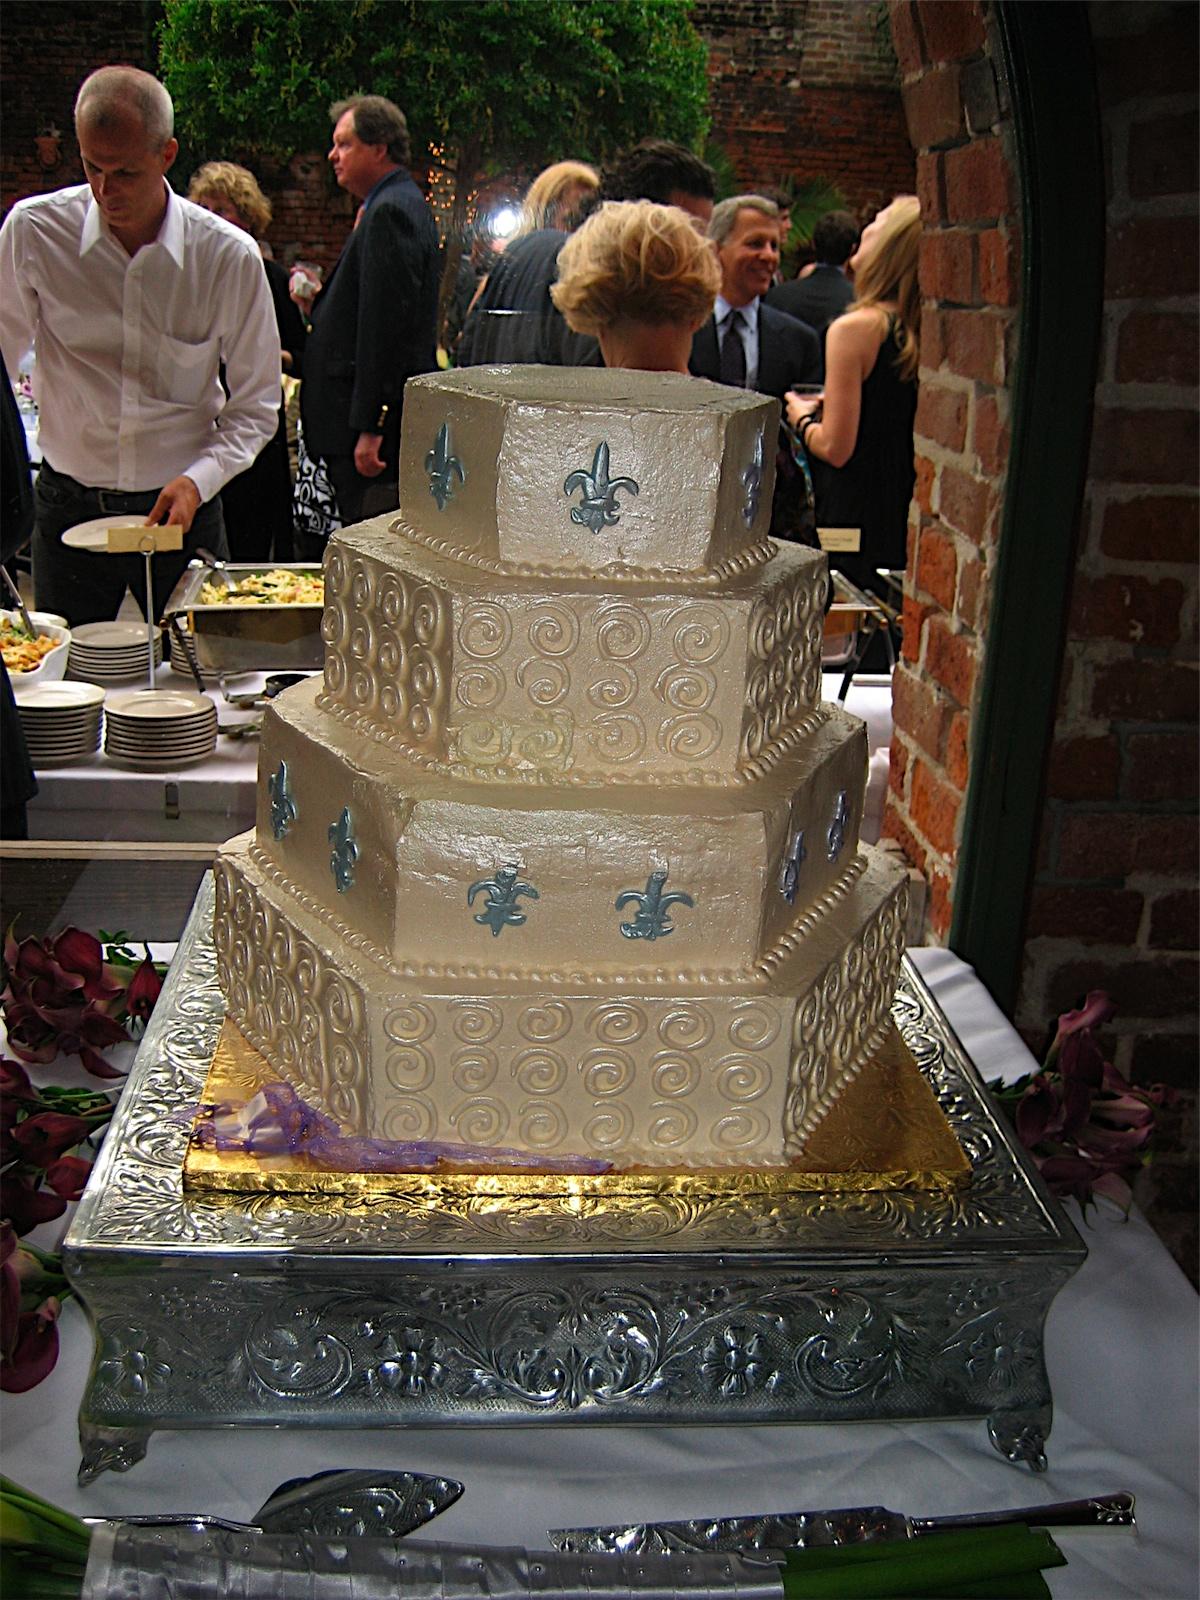 Mousse Filled Goodness Best Tasting Wedding Cake Ever Hands Down New Orleans La